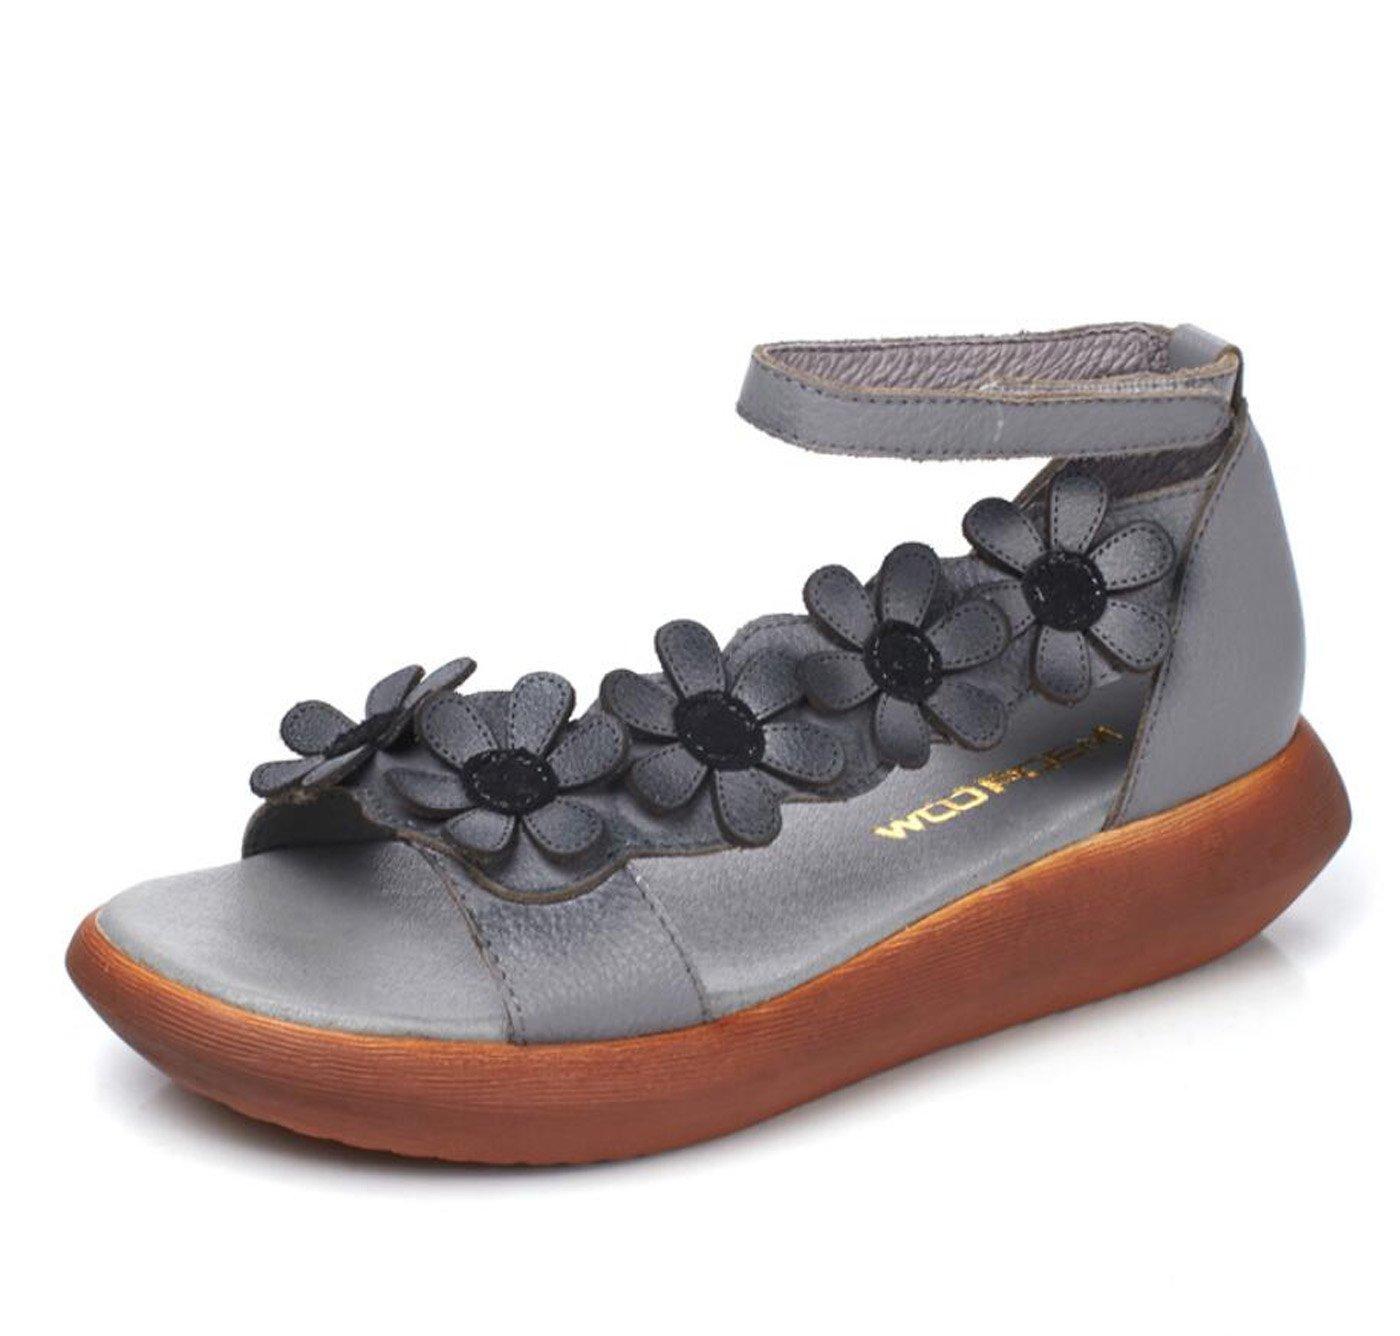 DANDANJIE Sandalen Damen Sommer Neue Mittlere Heels Handgemachte Blume Sandalen Wedges Heel Damen Schuhe (Farbe : Grau, Grouml;szlig;e : 38)  38|Grau